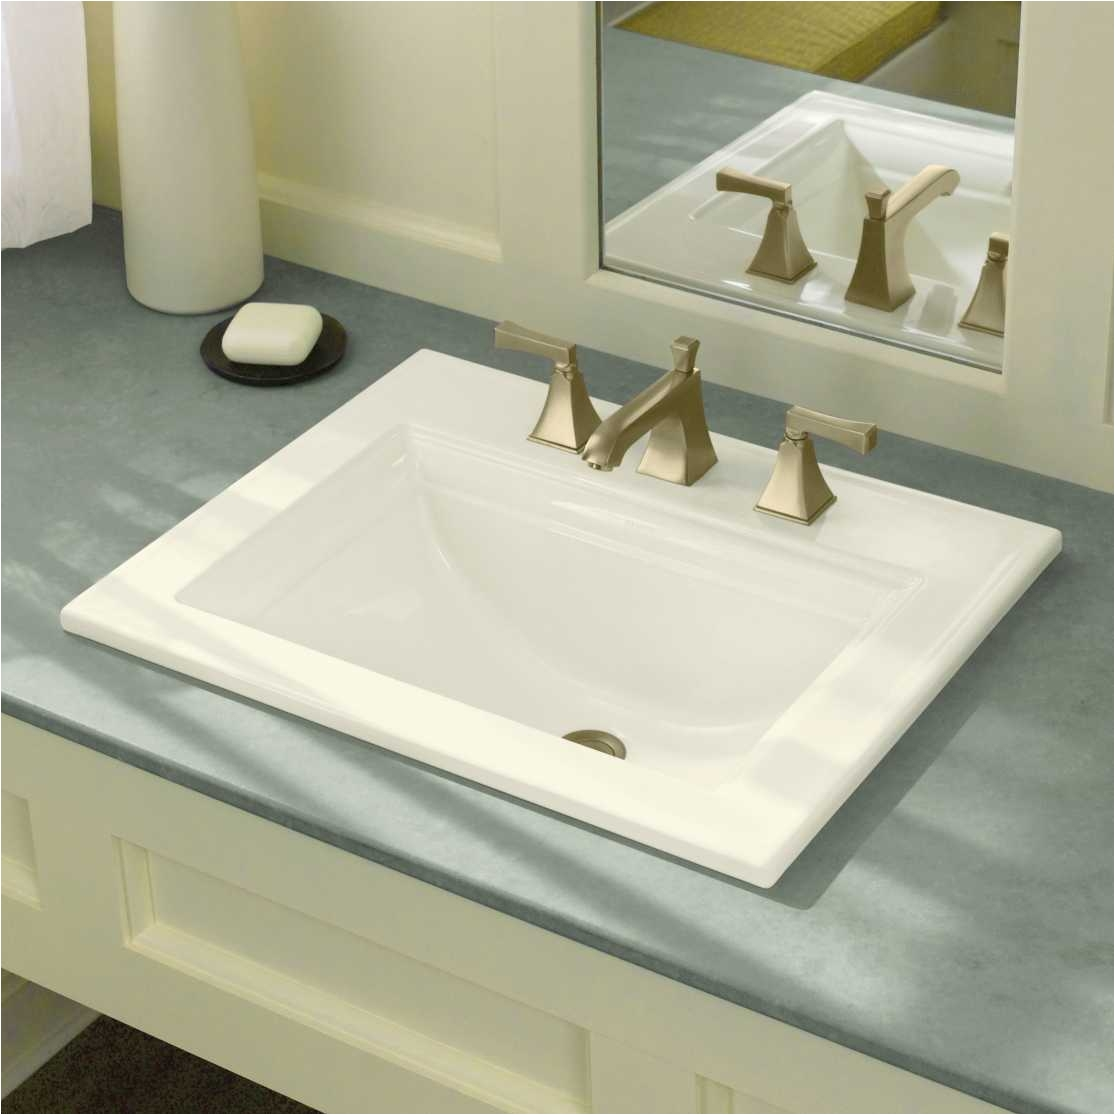 bathtub liners lowes choosed for elegant toilets lowes 0d gpyt info unique reglazing bathtub chicago cost